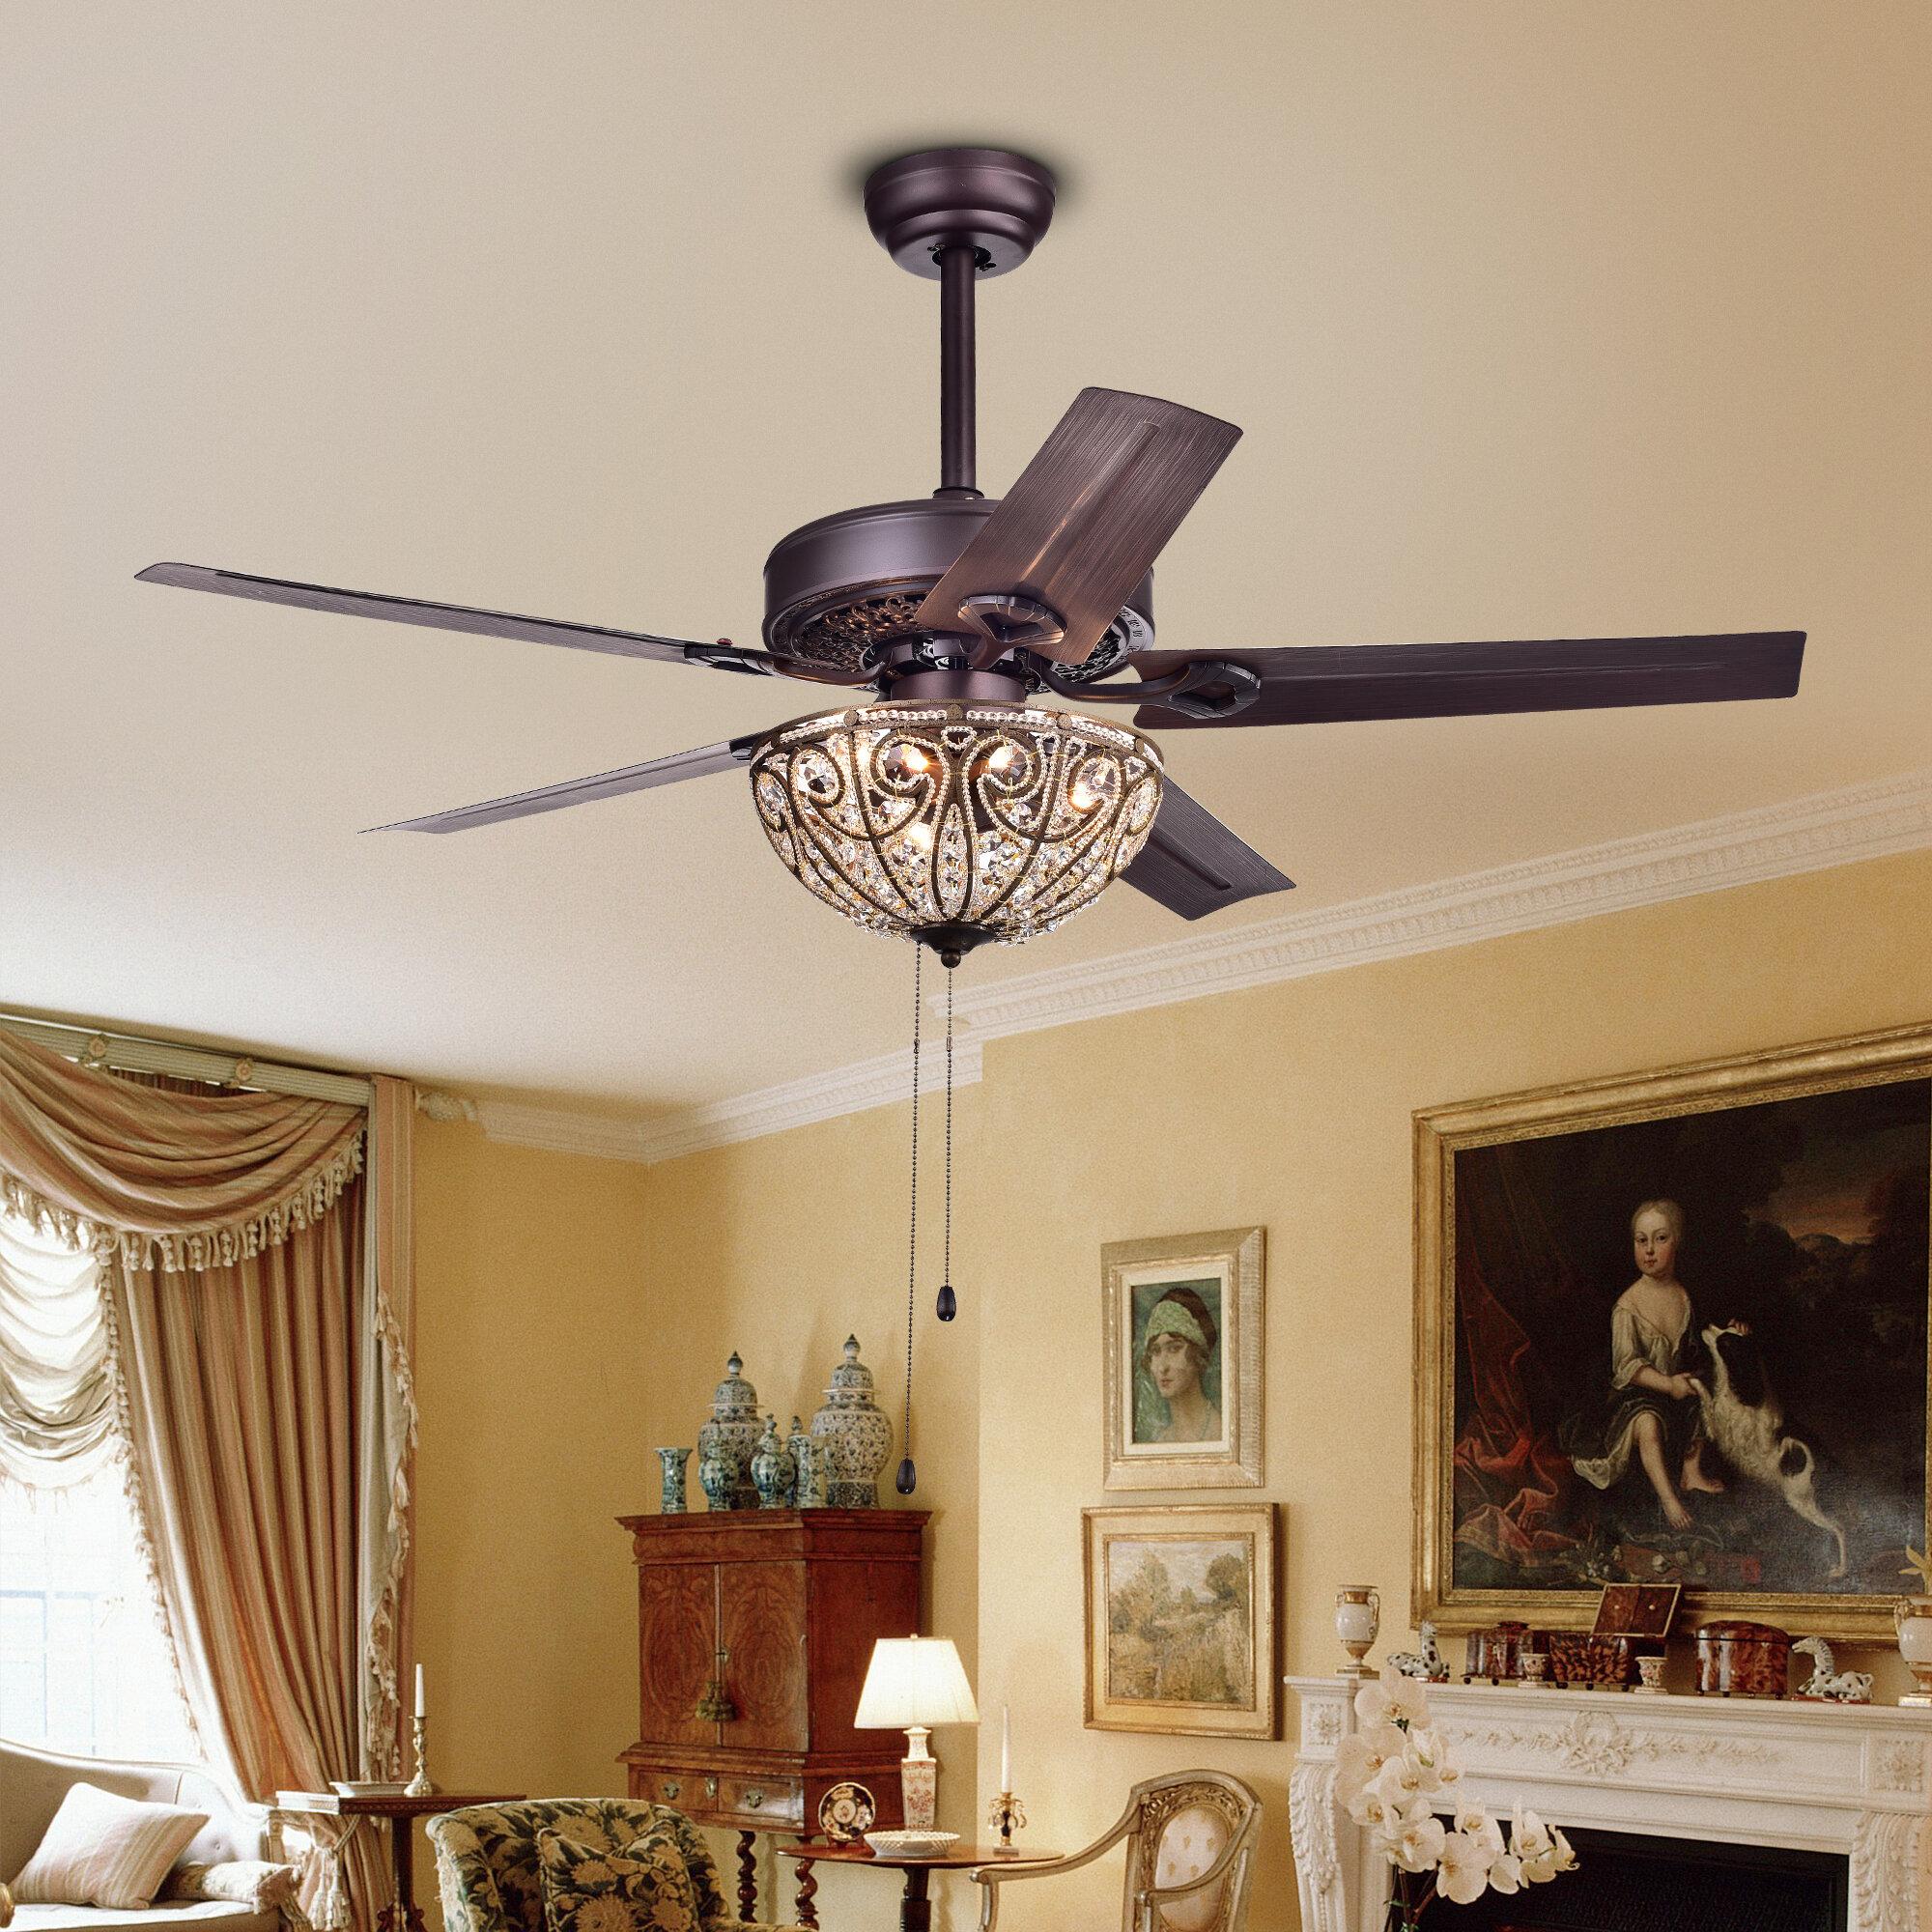 48 5 Blade Ceiling Fan Light Kit Included